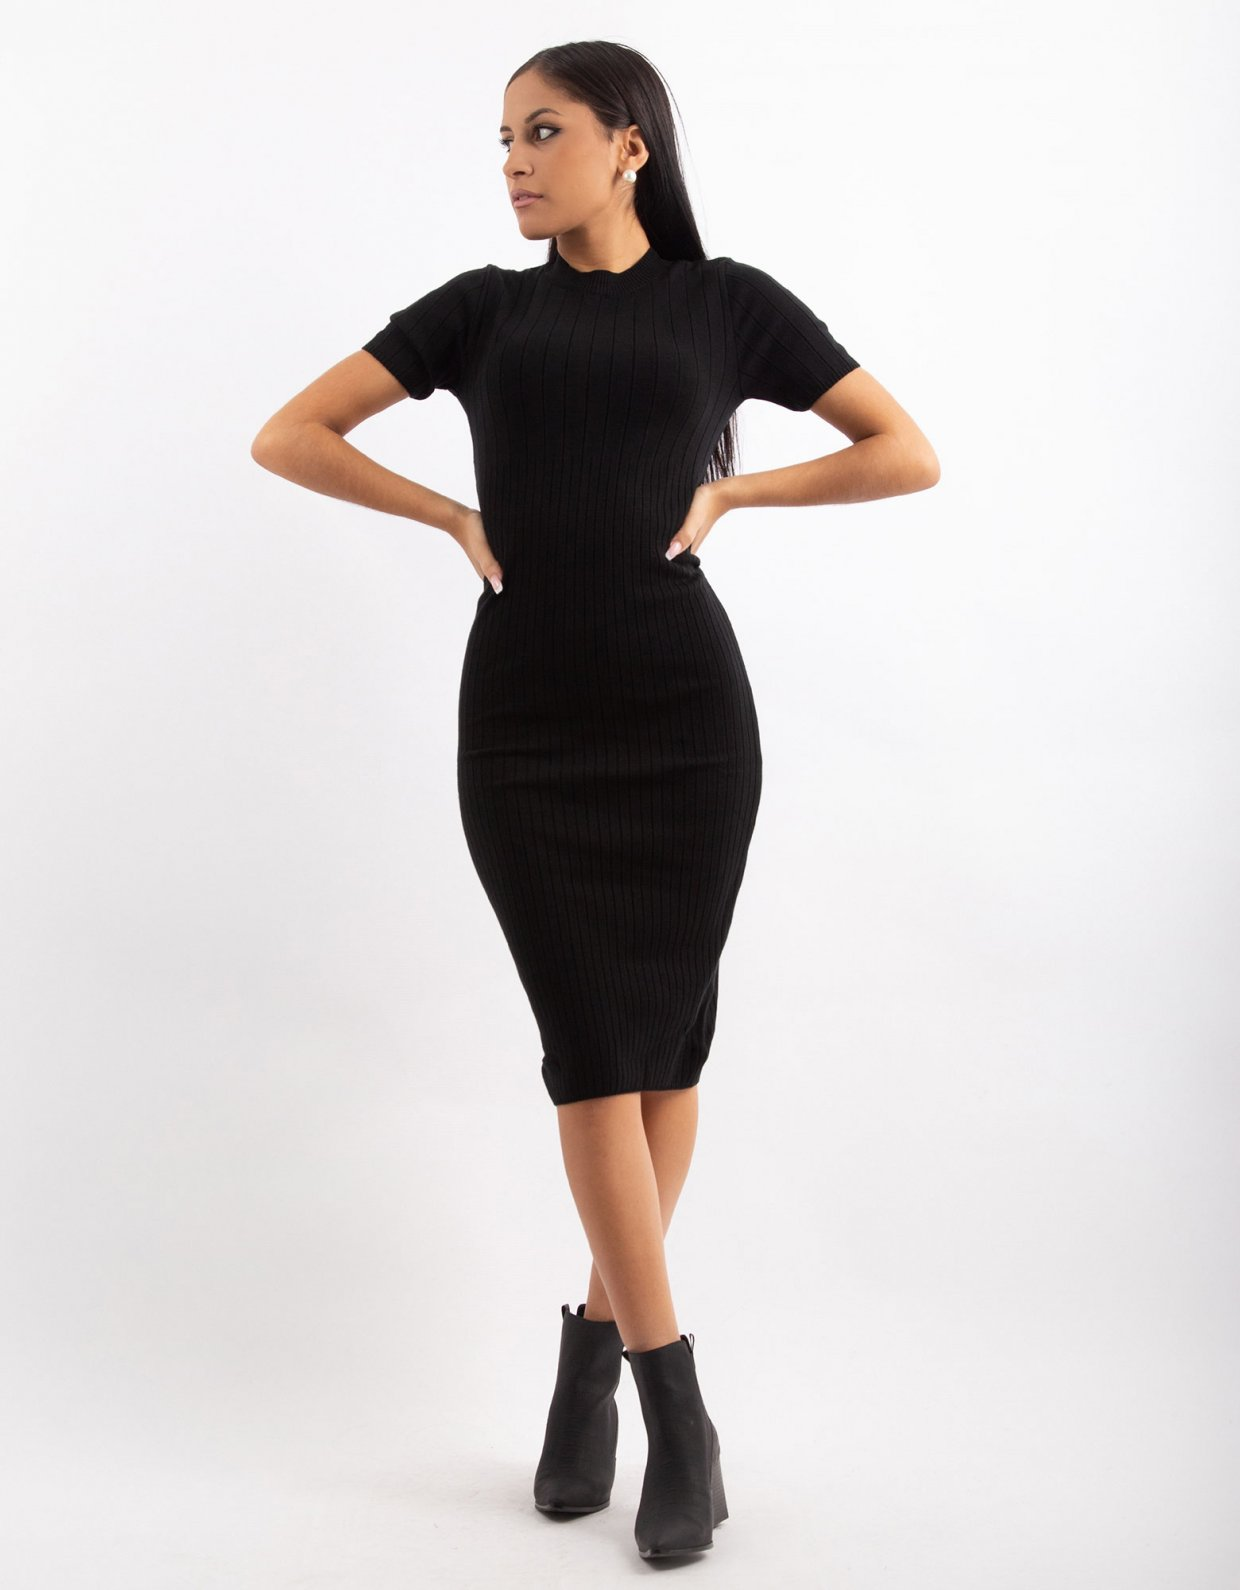 Combos Knitwear Combos W18 – Black round-neck midi dress